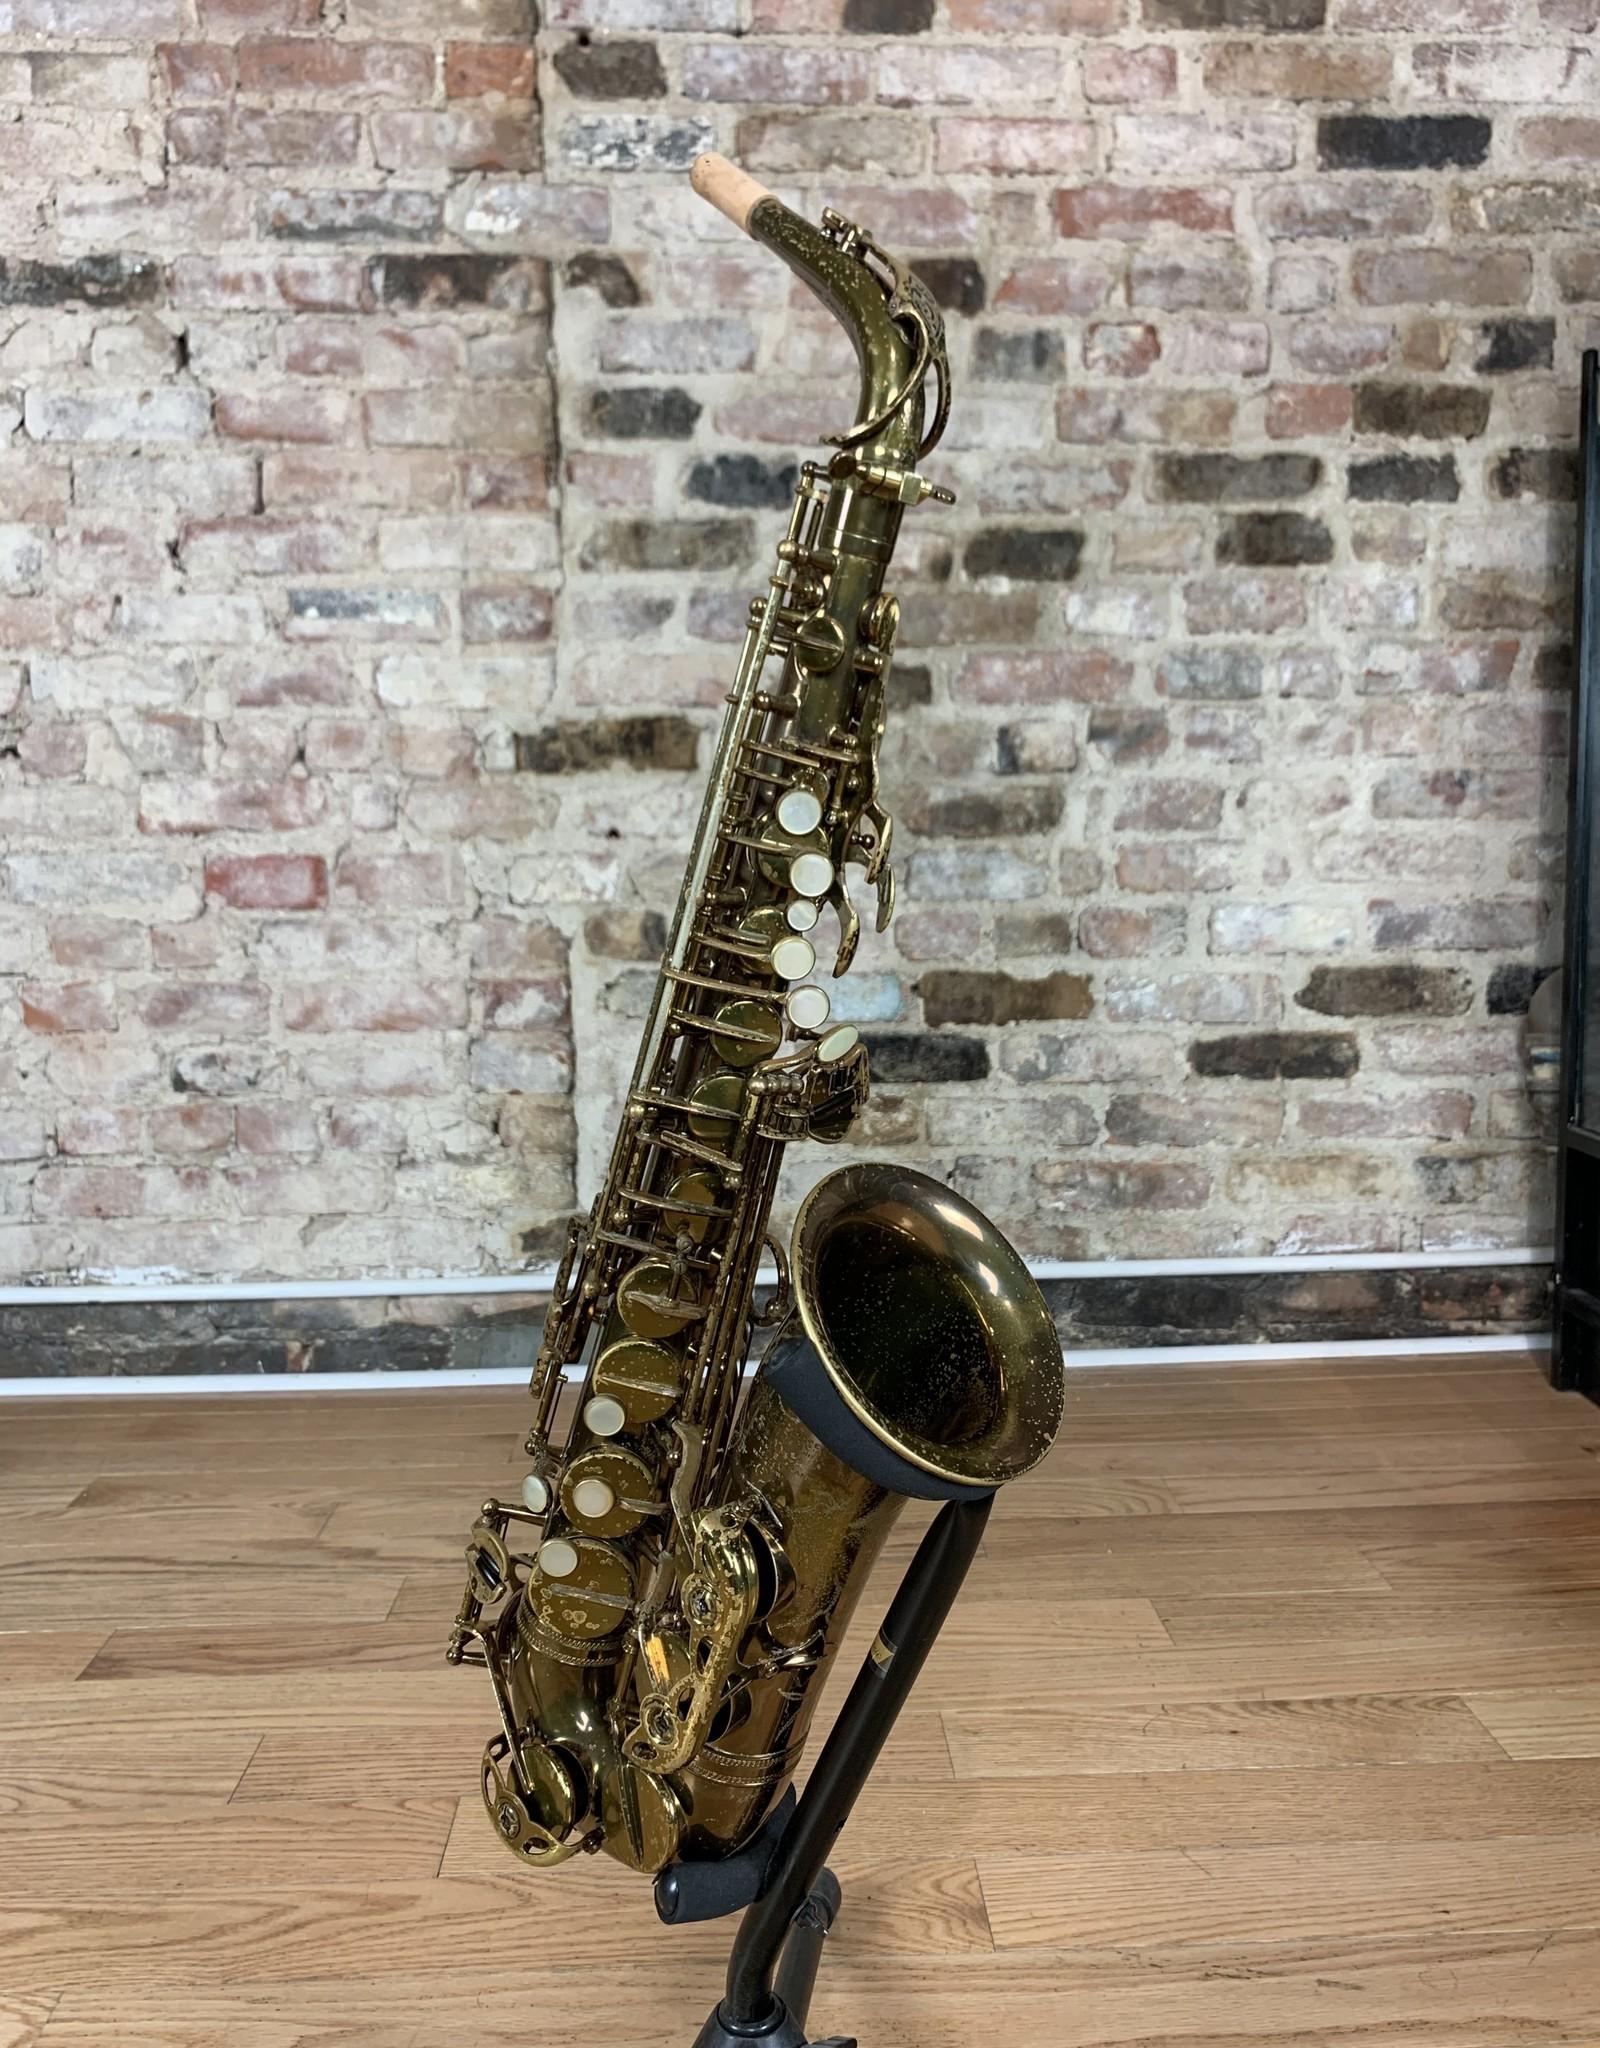 Selmer Selmer Mark VI alto saxophone 79XXX serial number Original Lacquer Fresh Overhaul Original Case Amazing Condition